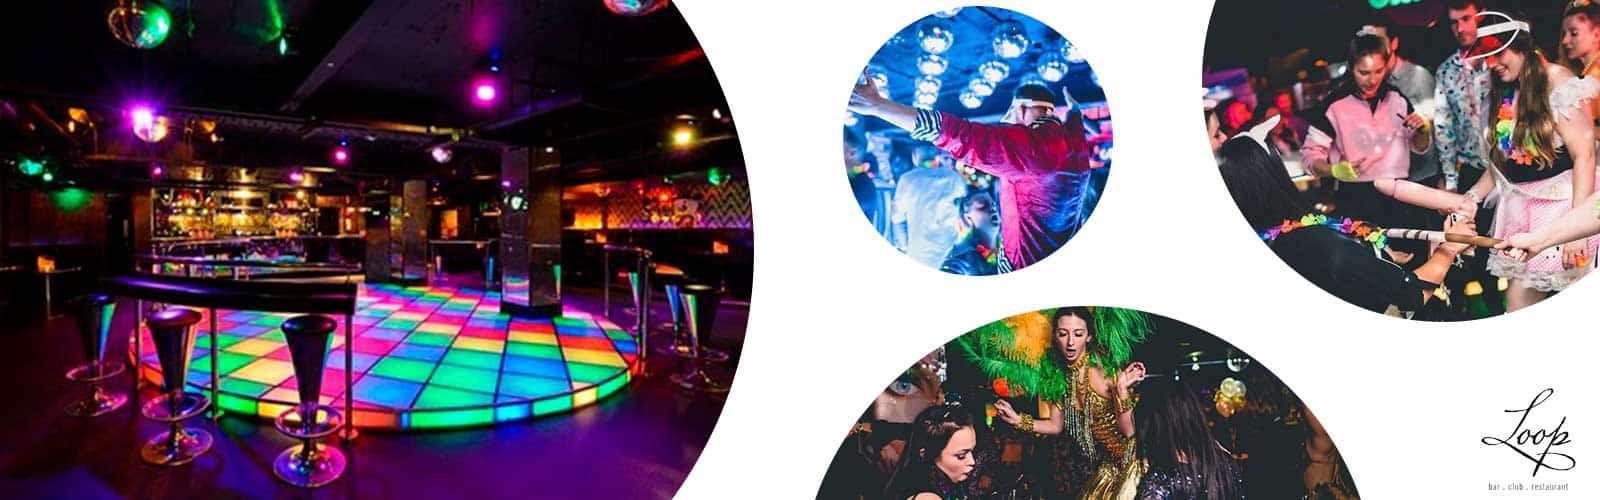 Loop bar London